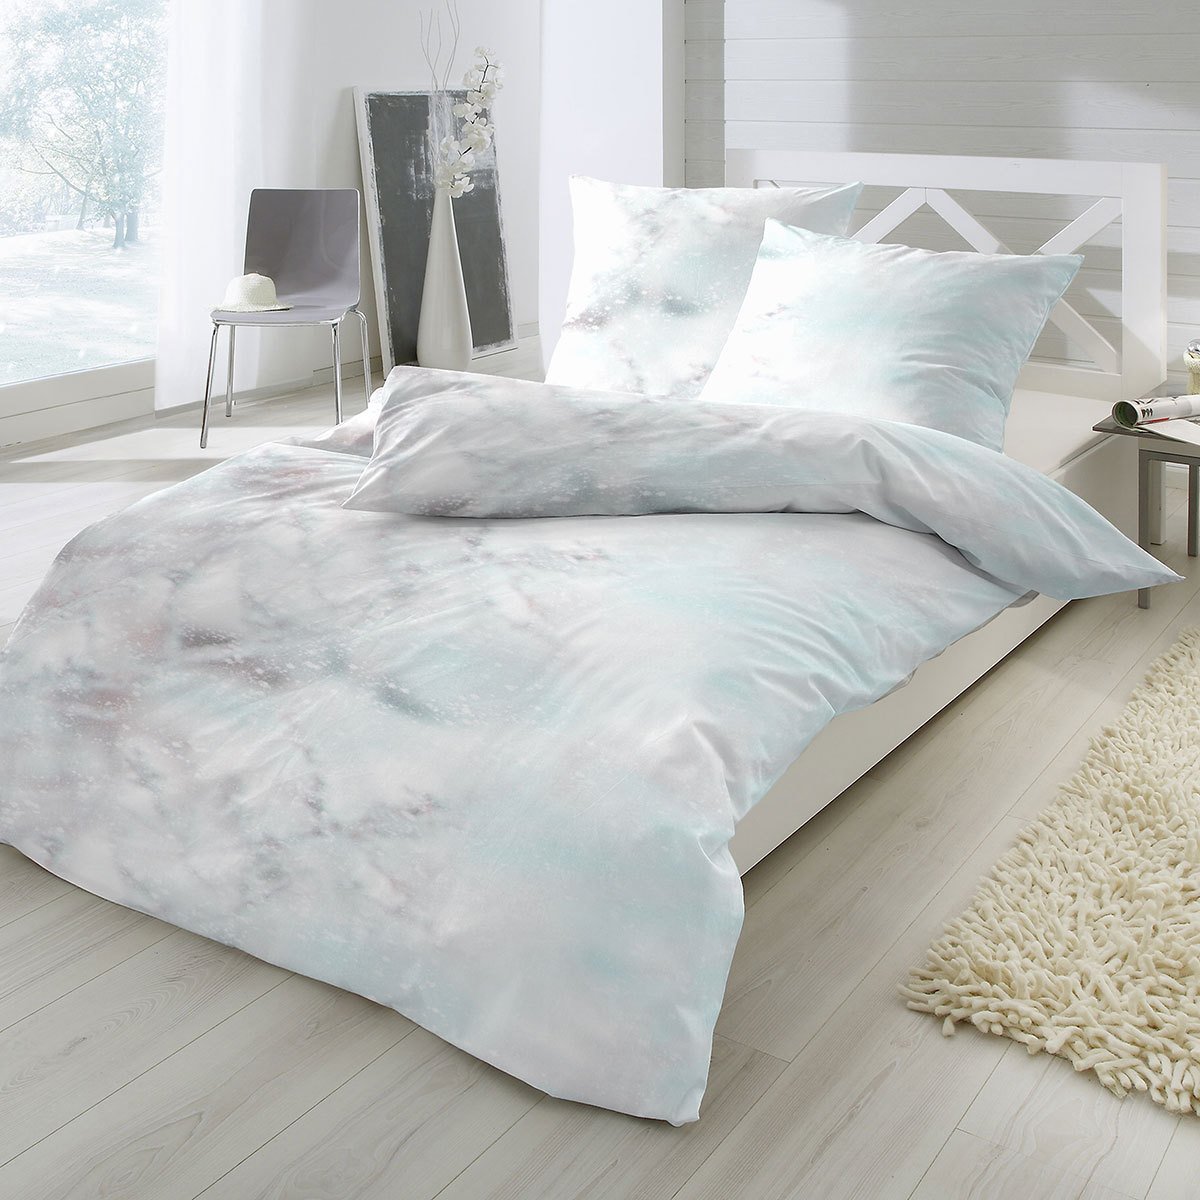 enrico coss mako satin bettw sche berlin gr n g nstig online kaufen bei bettwaren shop. Black Bedroom Furniture Sets. Home Design Ideas